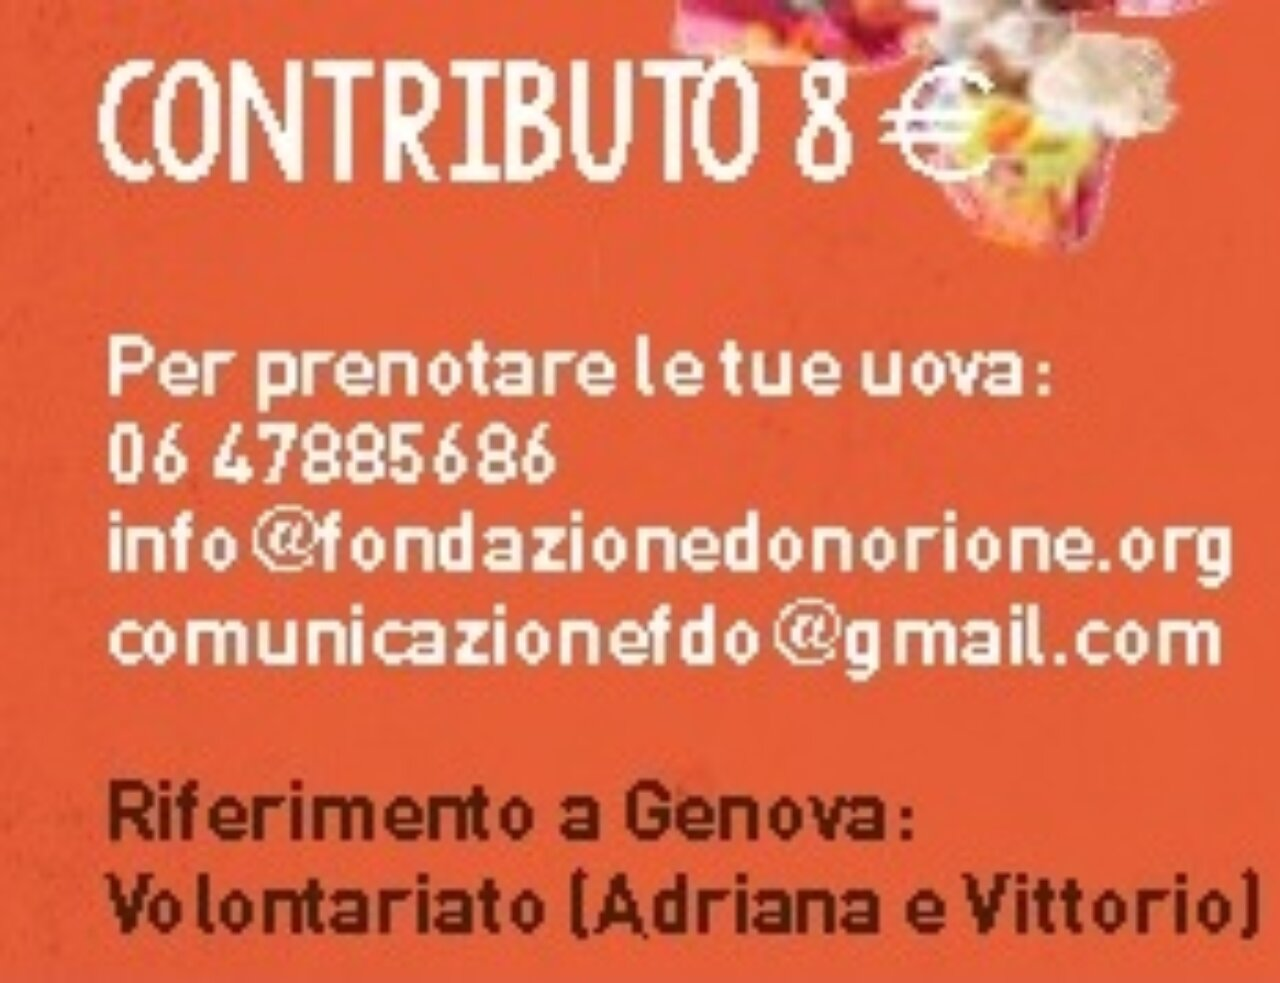 contributo 8